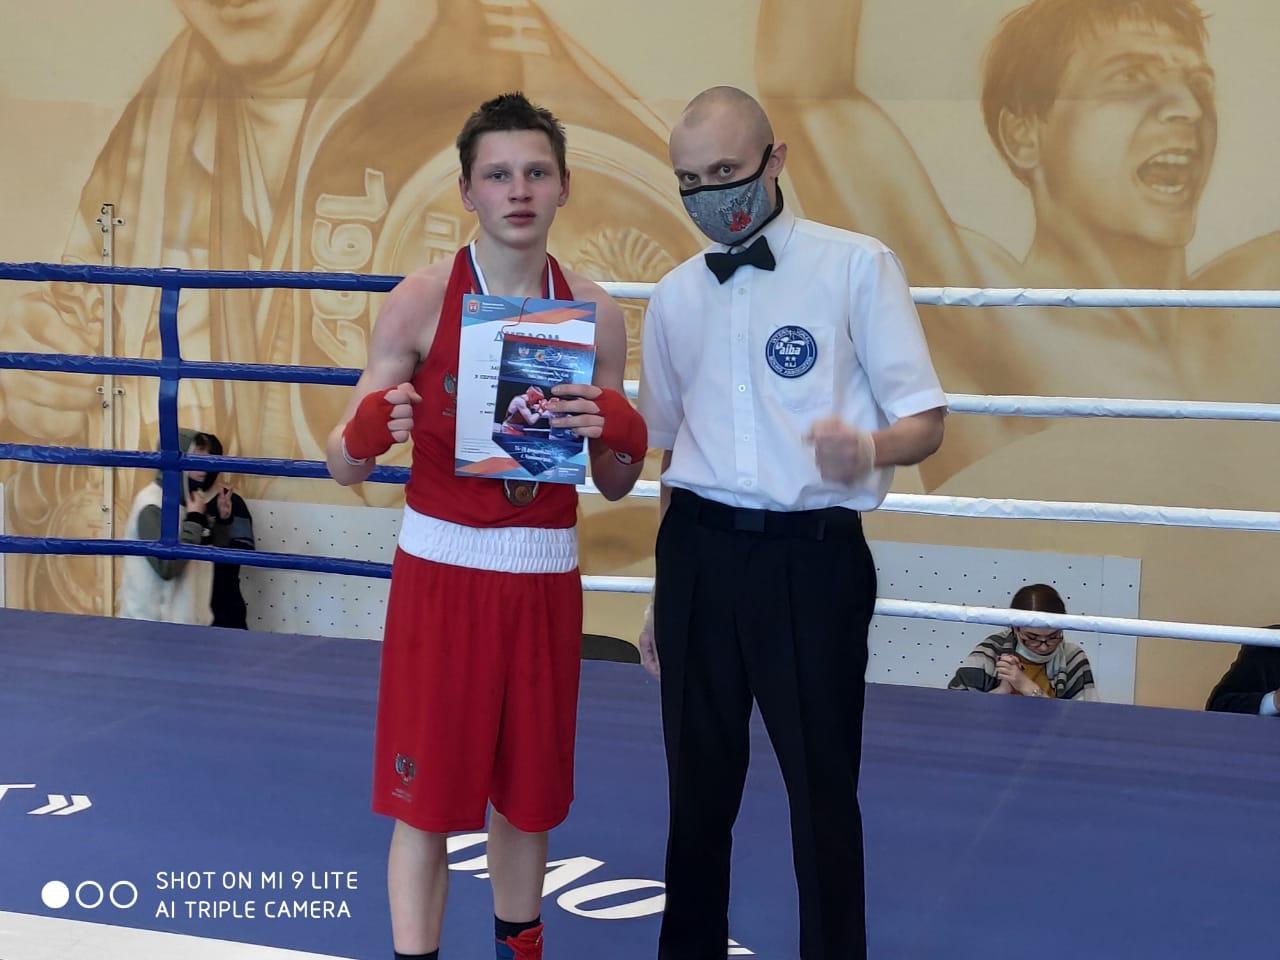 фото с первенства СЗФО по боксу юноши-девушки 15-16 лет 2021_10